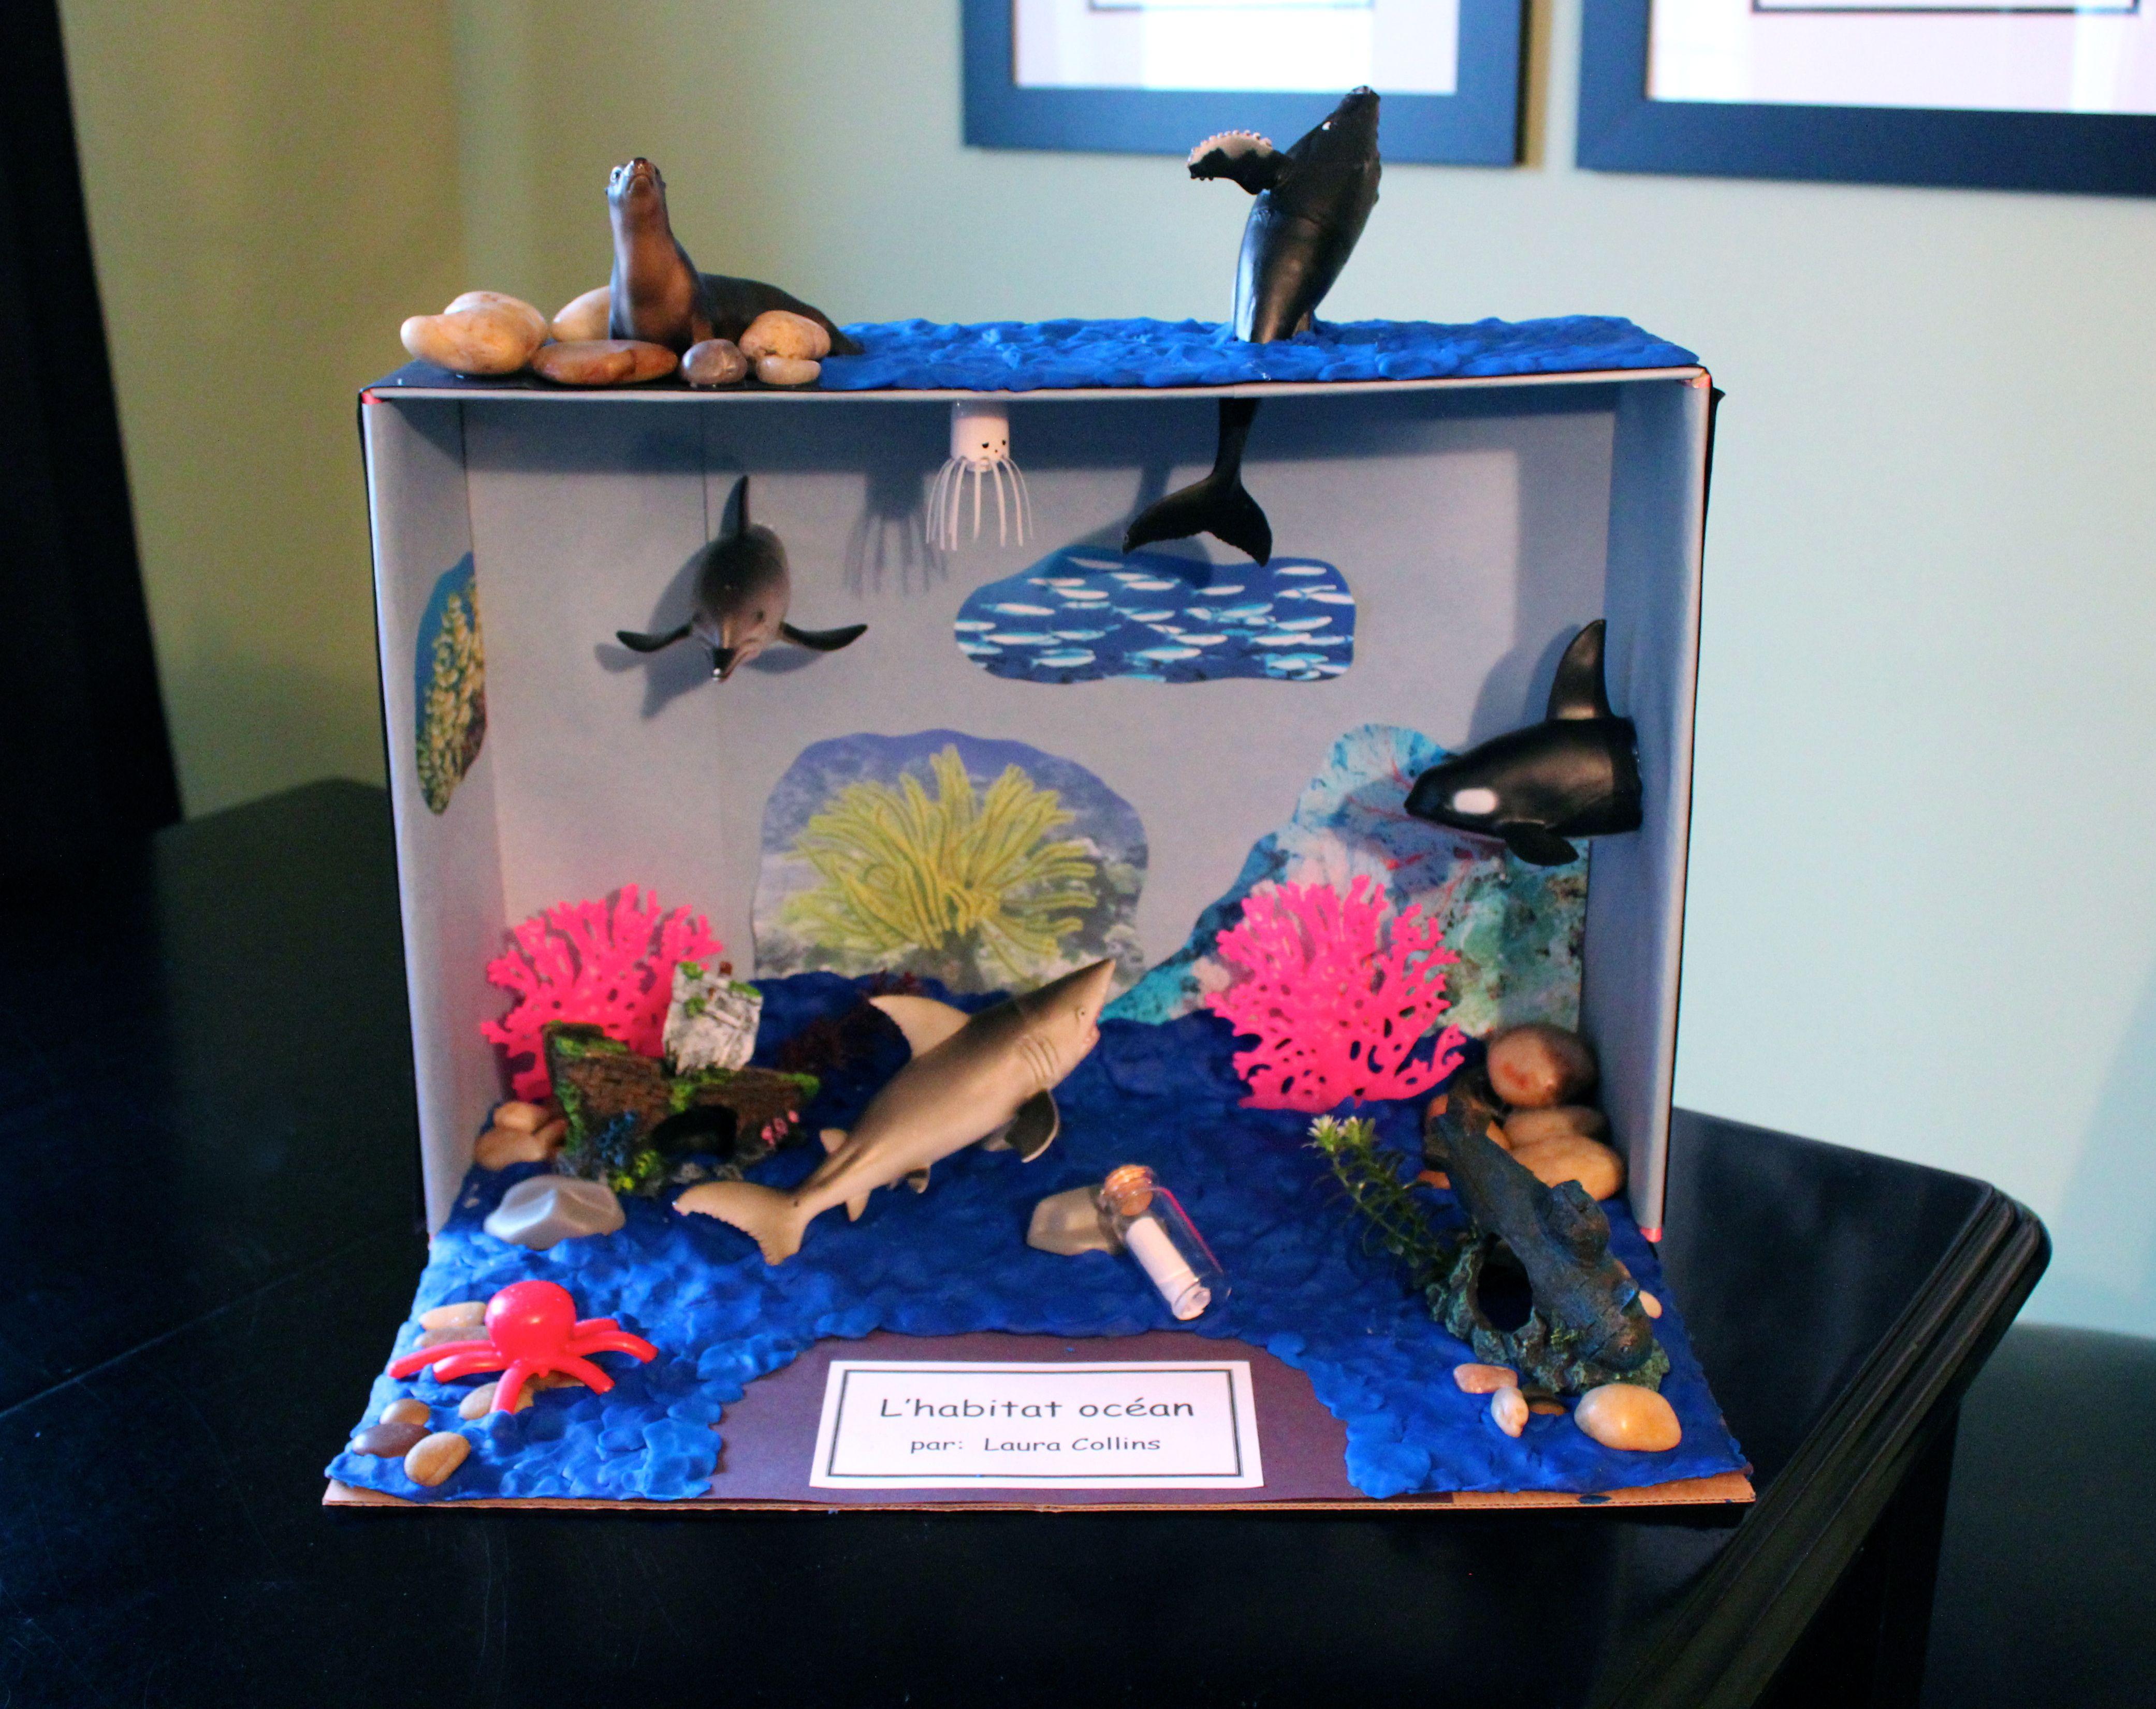 top ocean habitat diorama - photo #30